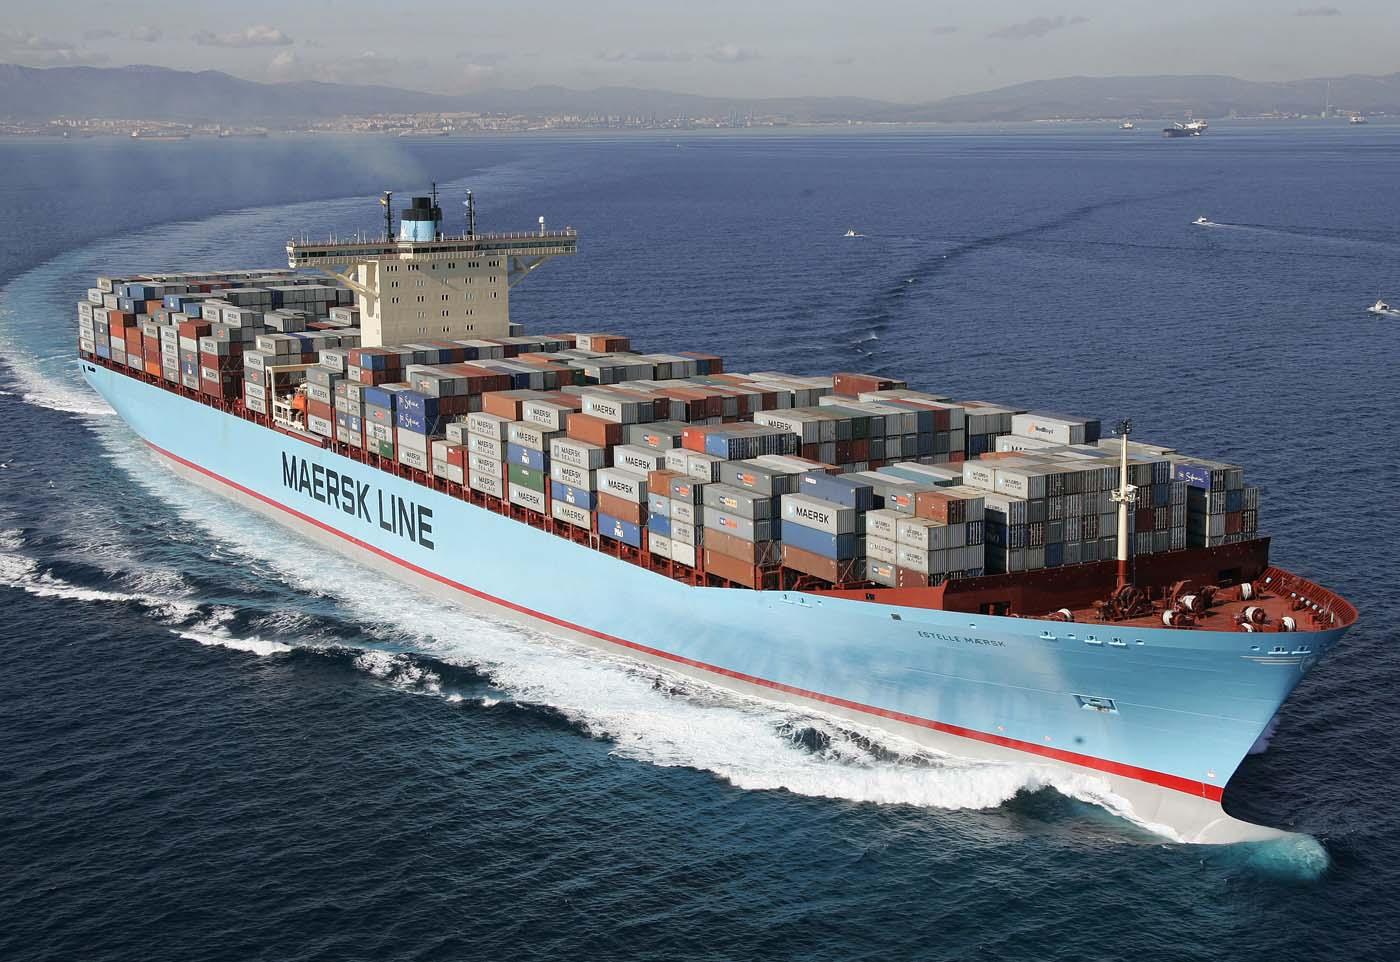 CORROSION_Maritime_Maersk_Line_Vessel_1400px.jpg